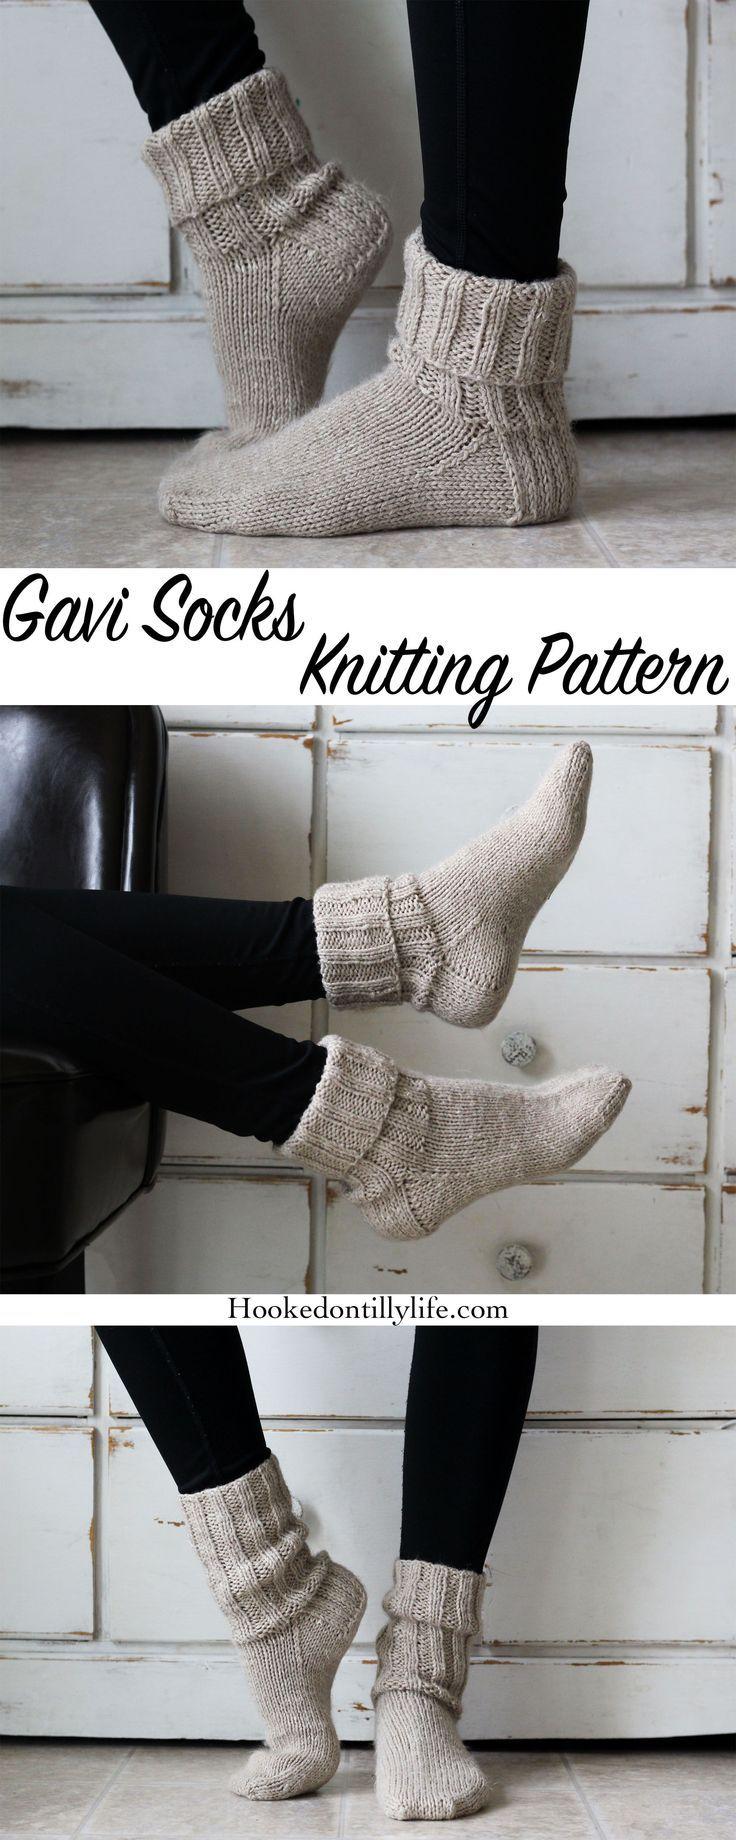 Gavi Socks Knitting Pattern